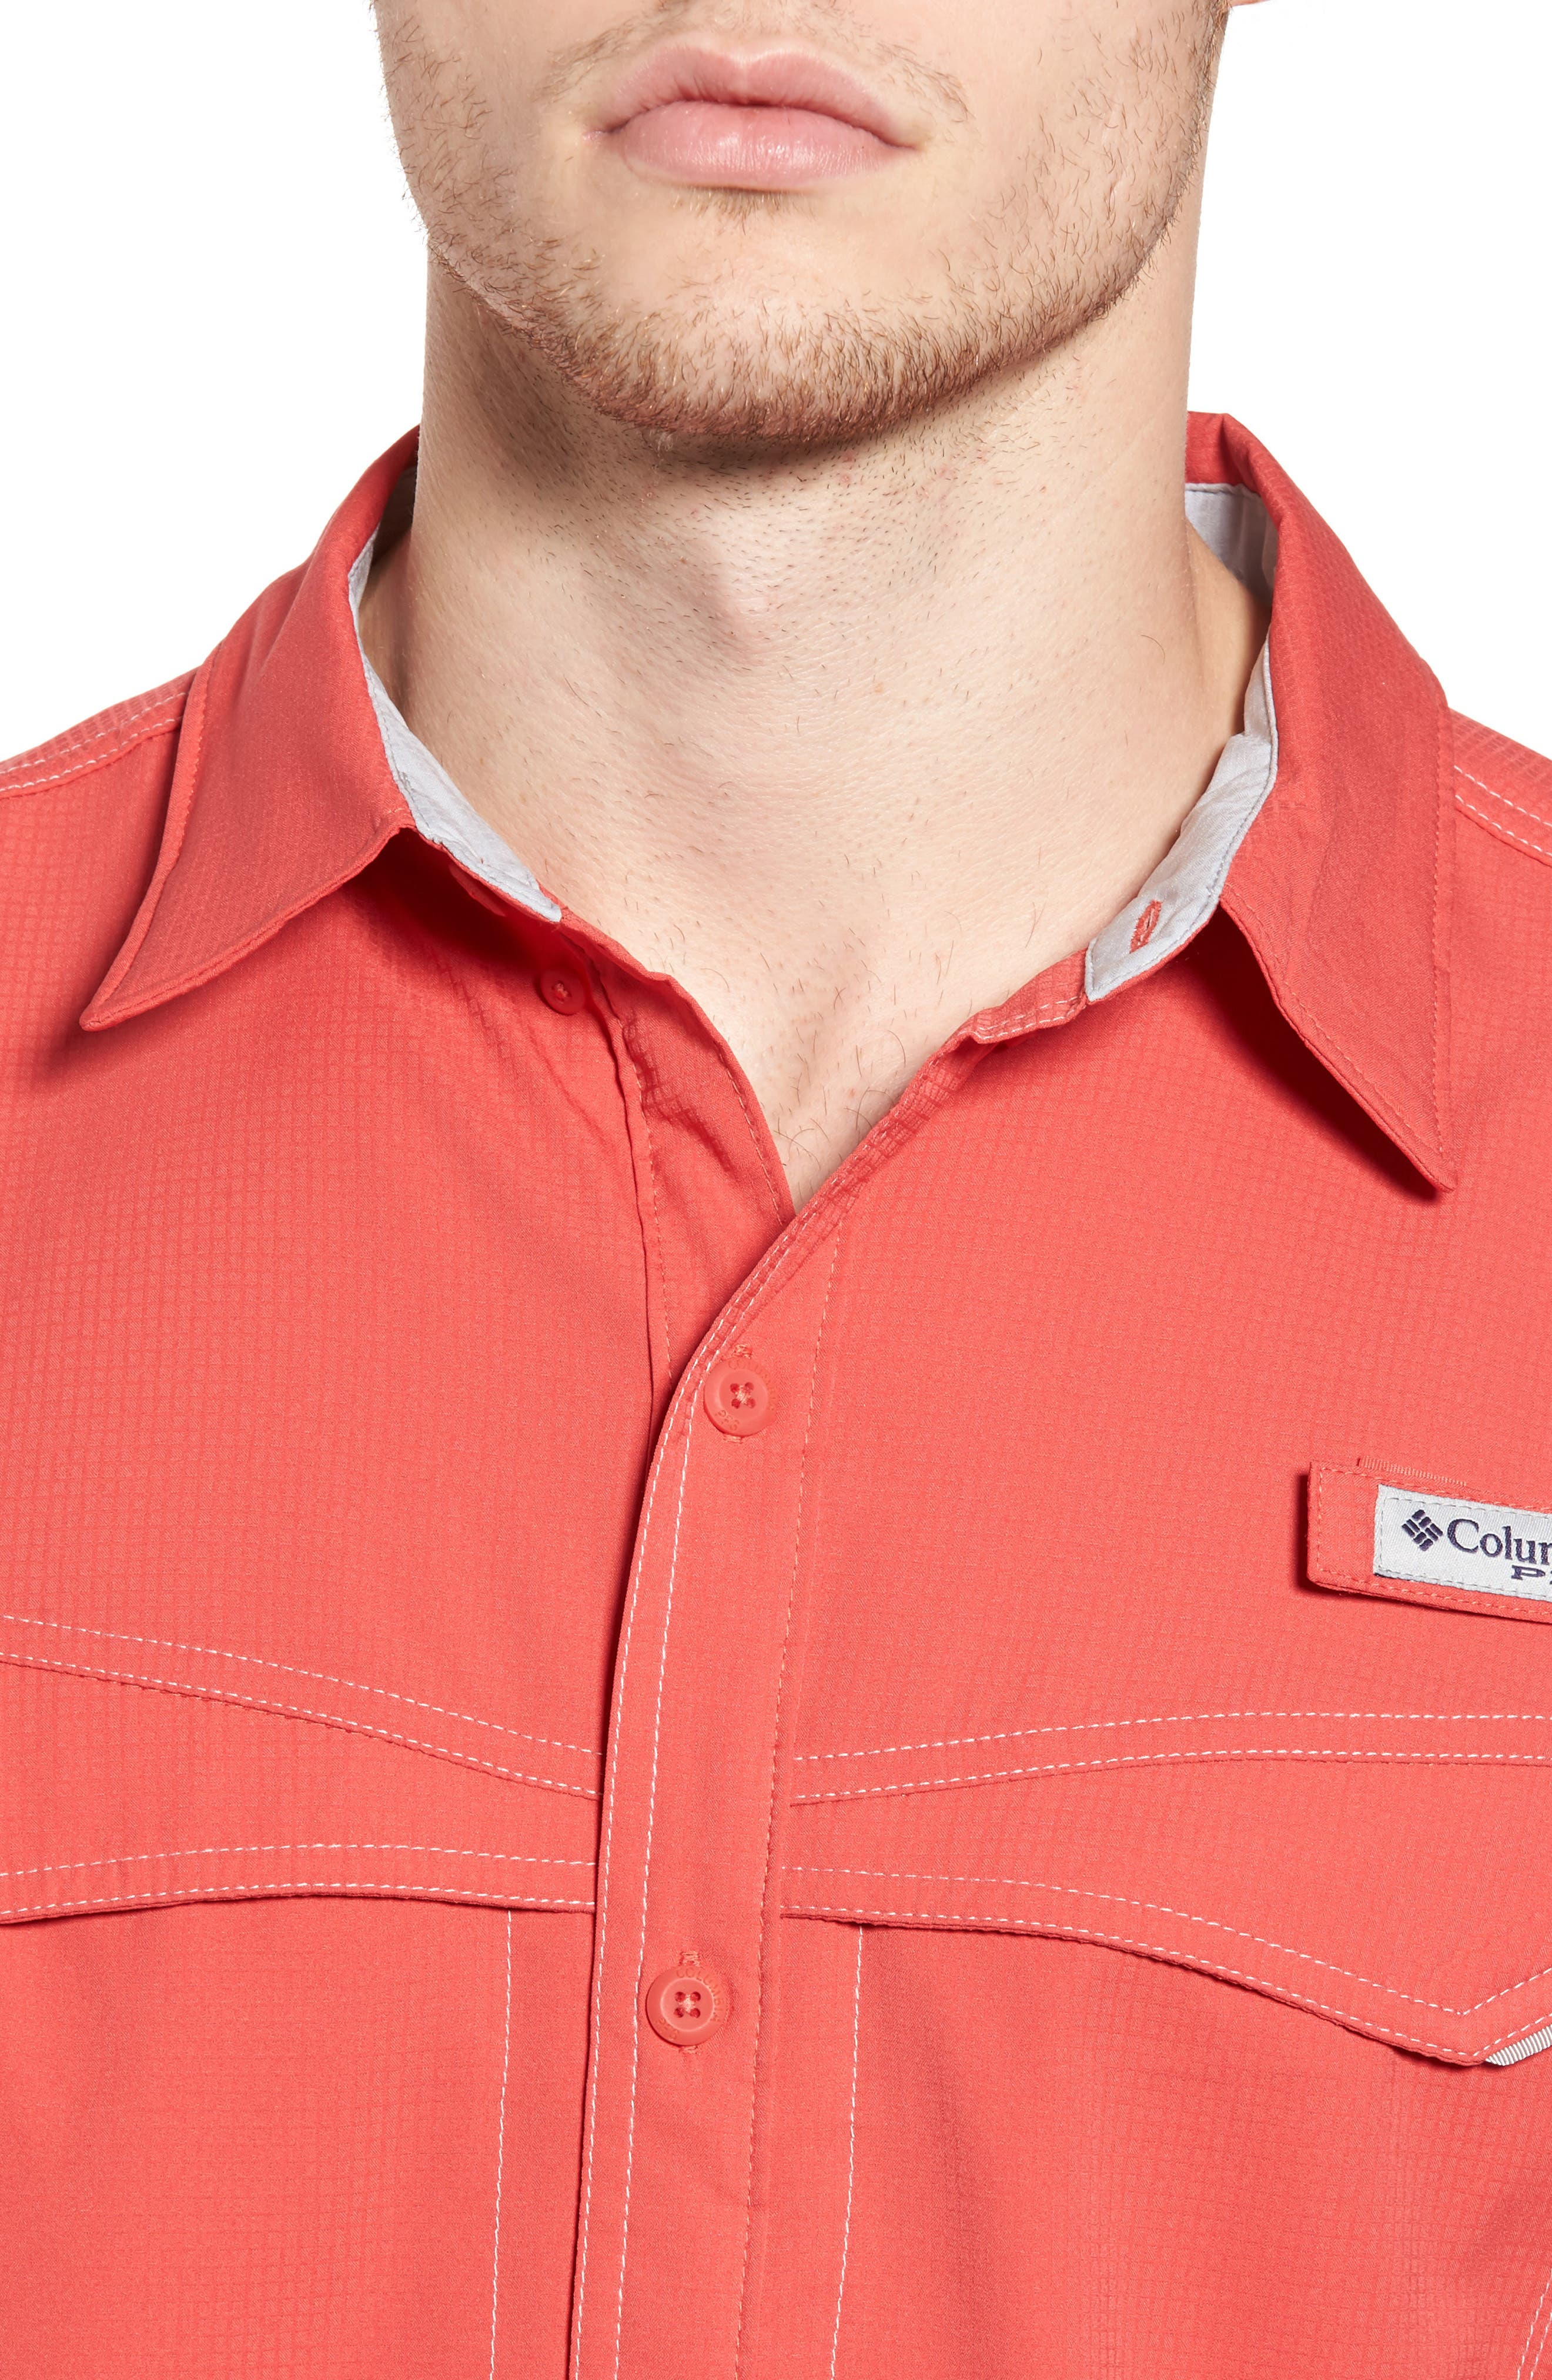 PFG Low Drag Offshore Woven Shirt,                             Alternate thumbnail 4, color,                             Sunset Red